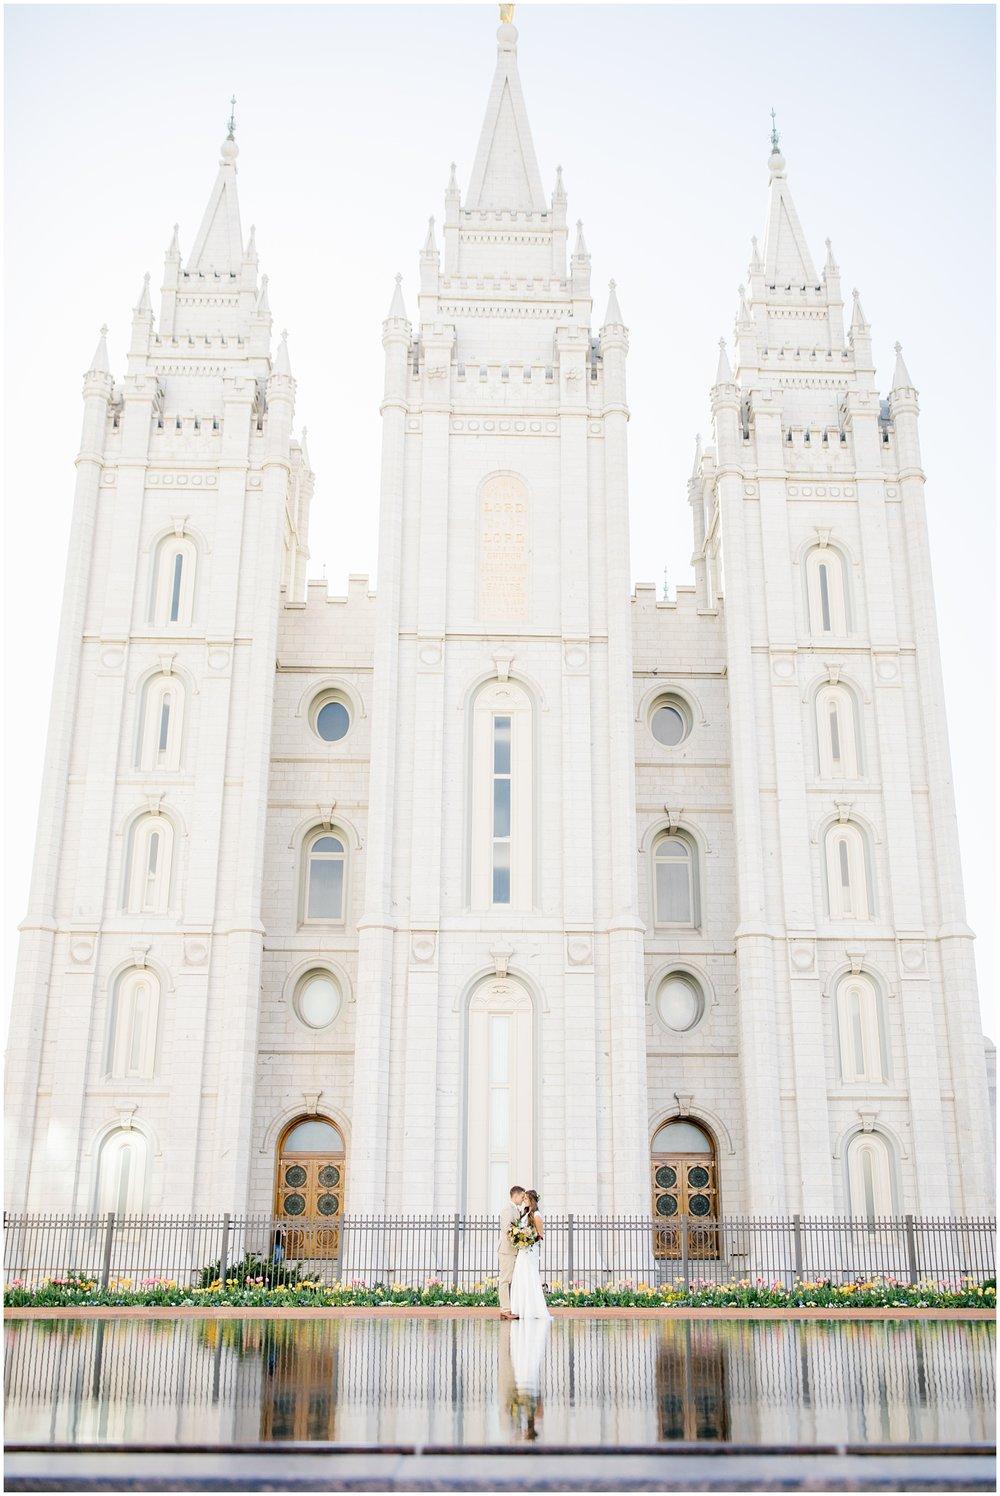 JC-Wedding-206_Lizzie-B-Imagery-Utah-Wedding-Photographer-Park-City-Salt-Lake-City-Temple-Joseph-Smith-Memorial-Building-Empire-Room.jpg